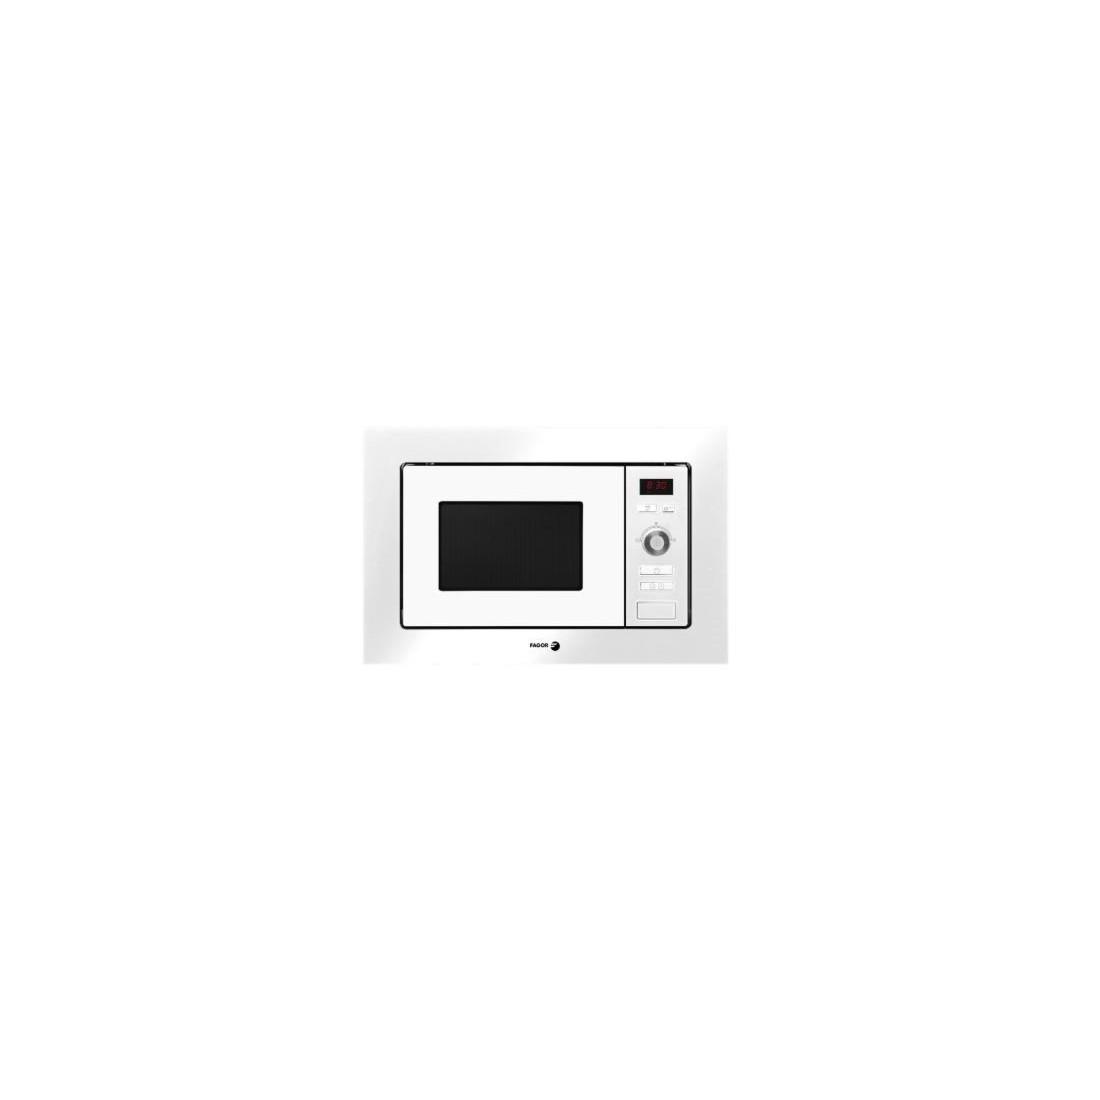 Microondas Integrable - Fagor 3MWB-20CEGB, Blanco